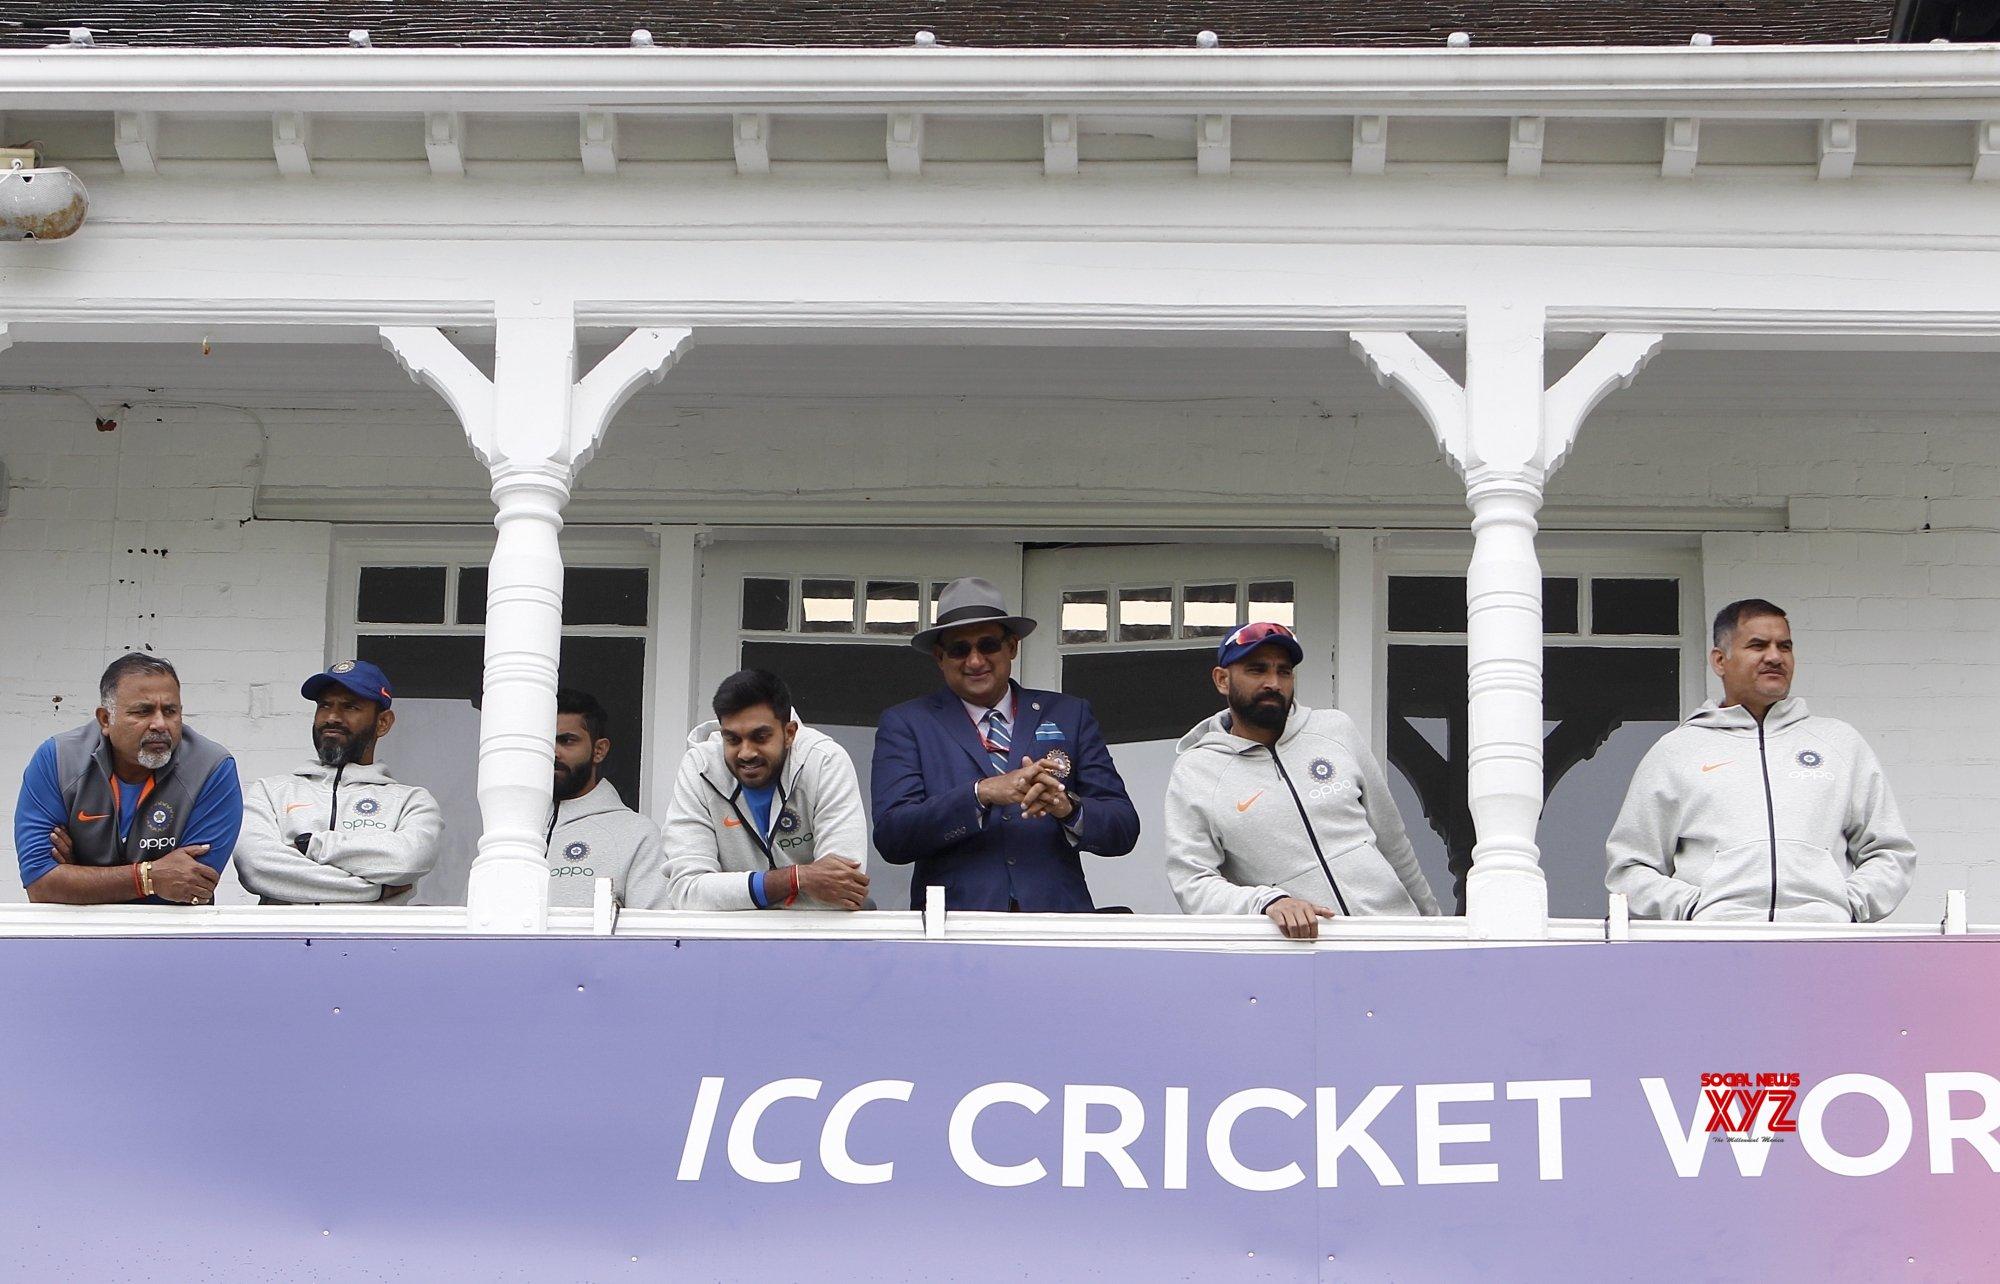 Nottingham (England): World Cup 2019 - Match 18 - India Vs New Zealand (Batch - 7) #Gallery